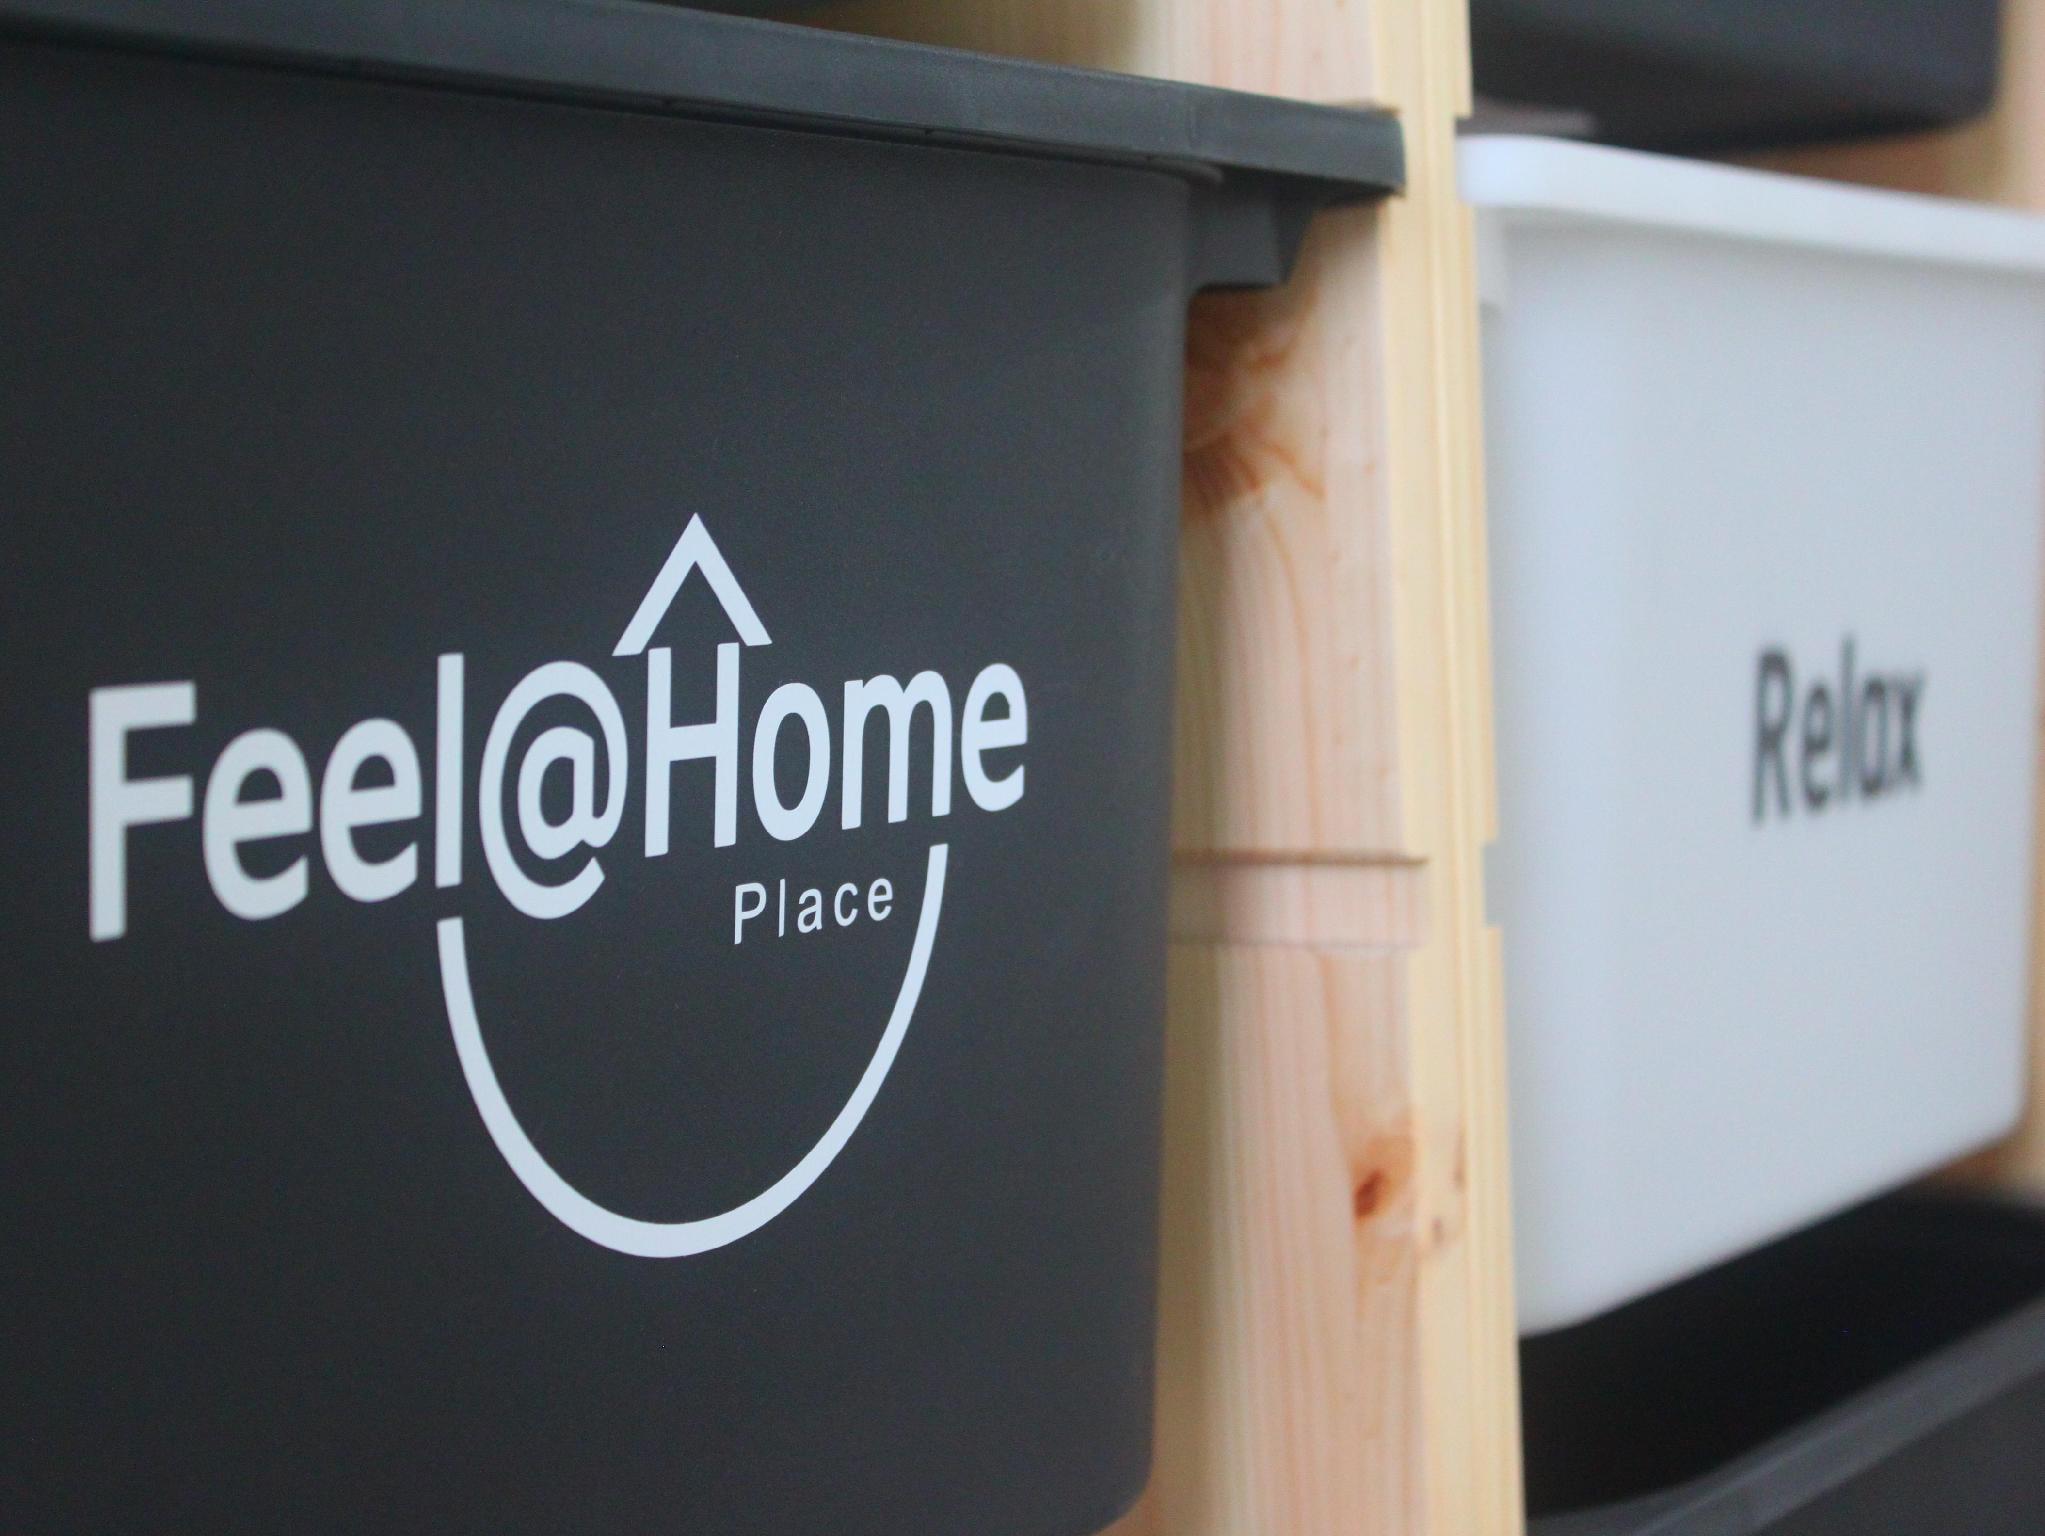 Feel@Home Place ฟีล แอท โฮม เพลส